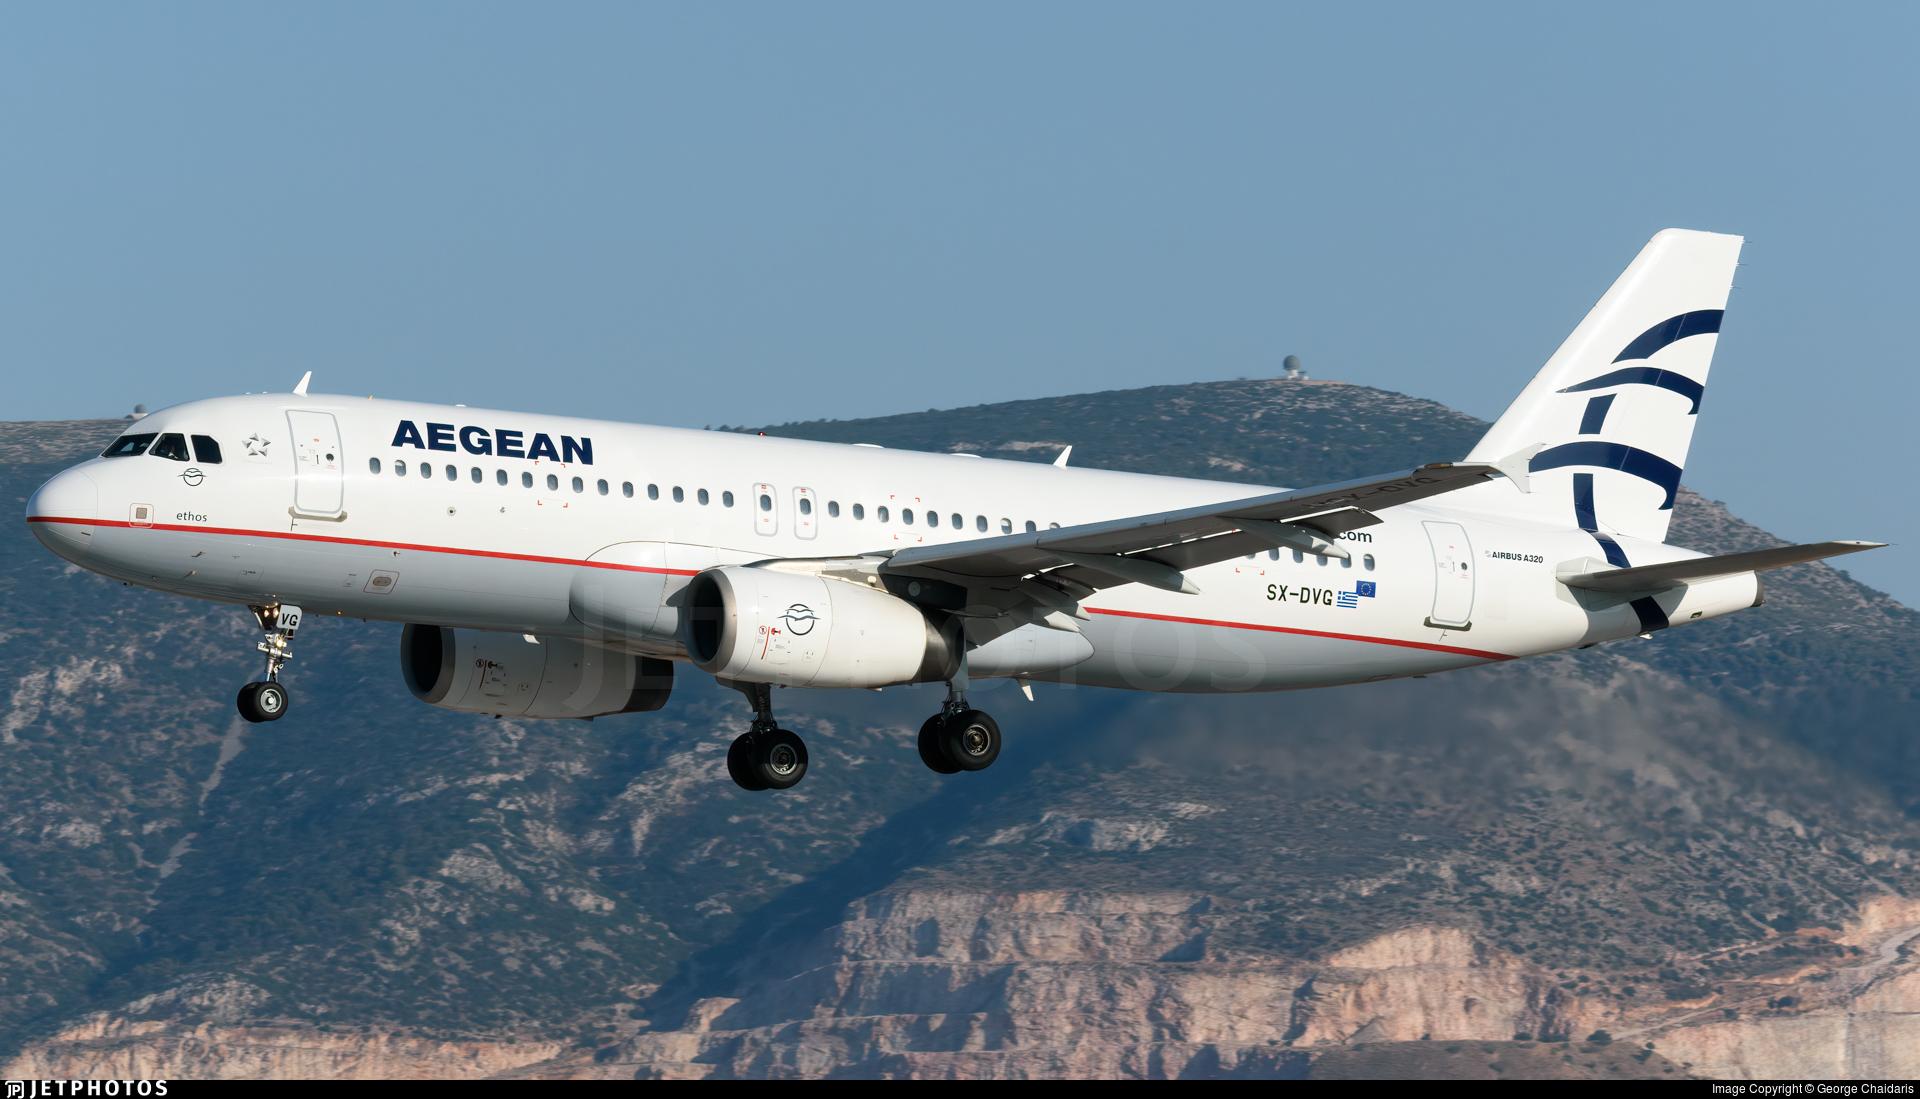 SX-DVG - Airbus A320-232 - Aegean Airlines